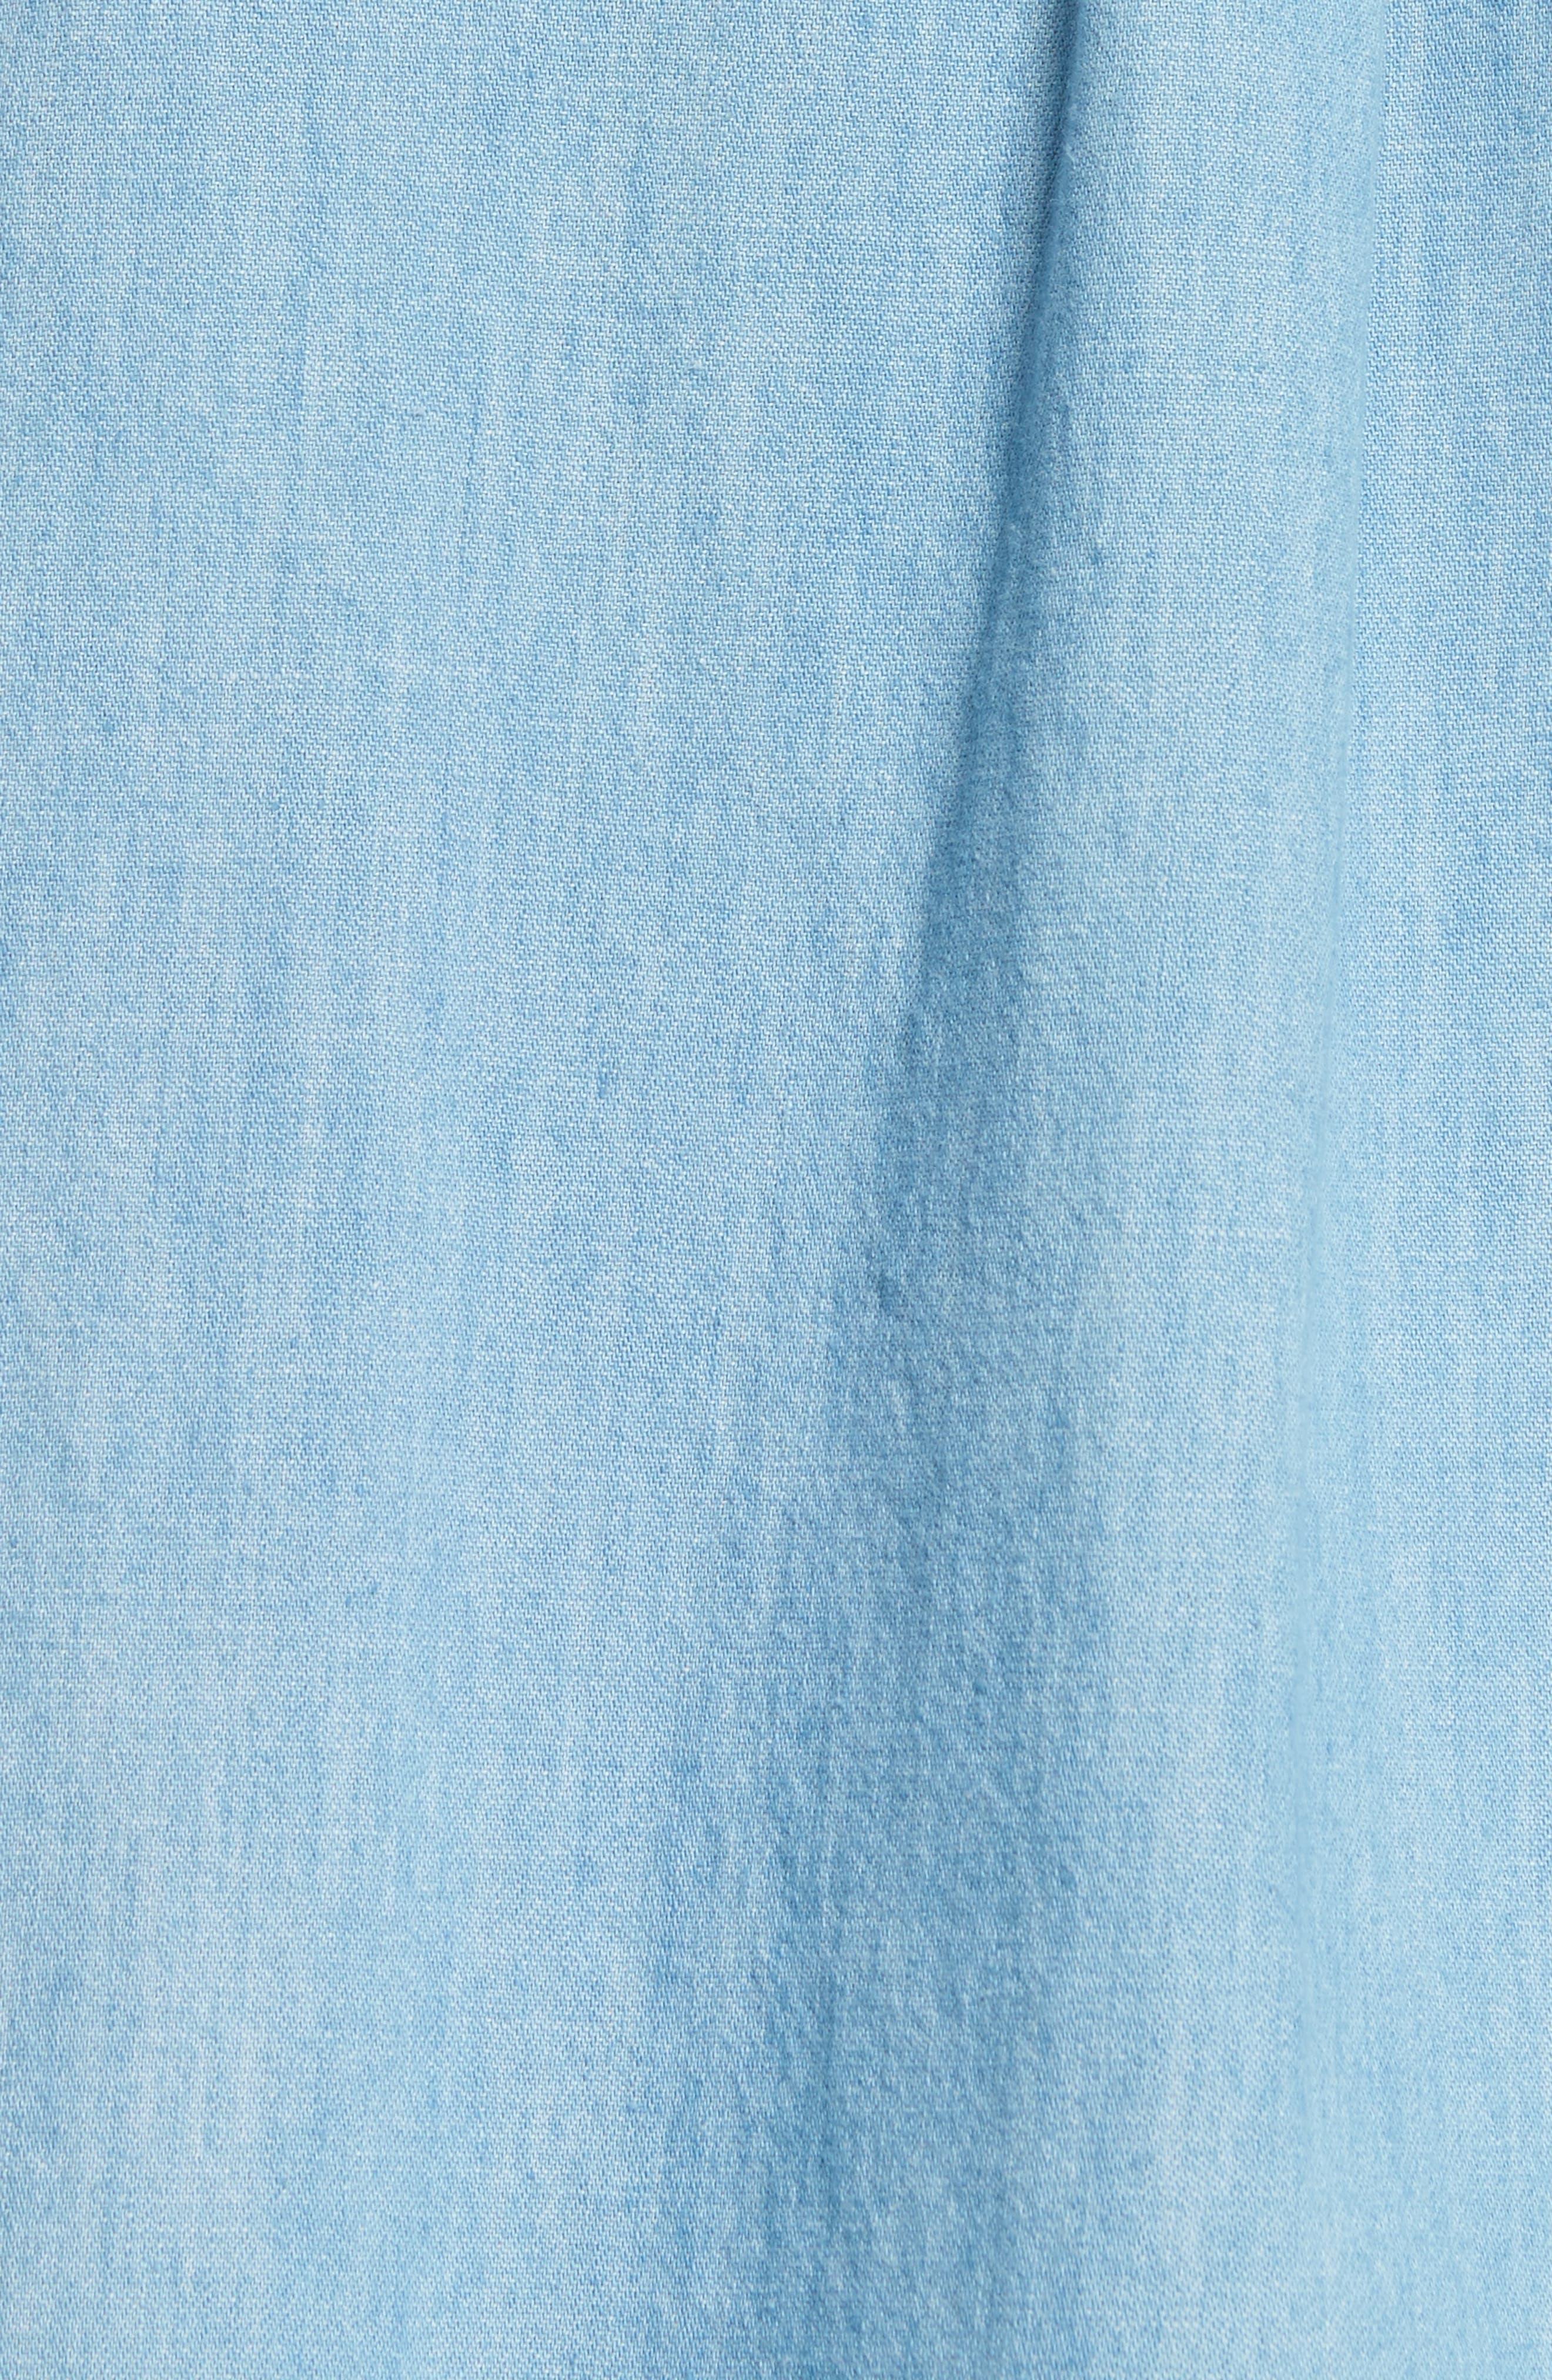 Chambray Shirt,                             Alternate thumbnail 5, color,                             Bleu Iaa